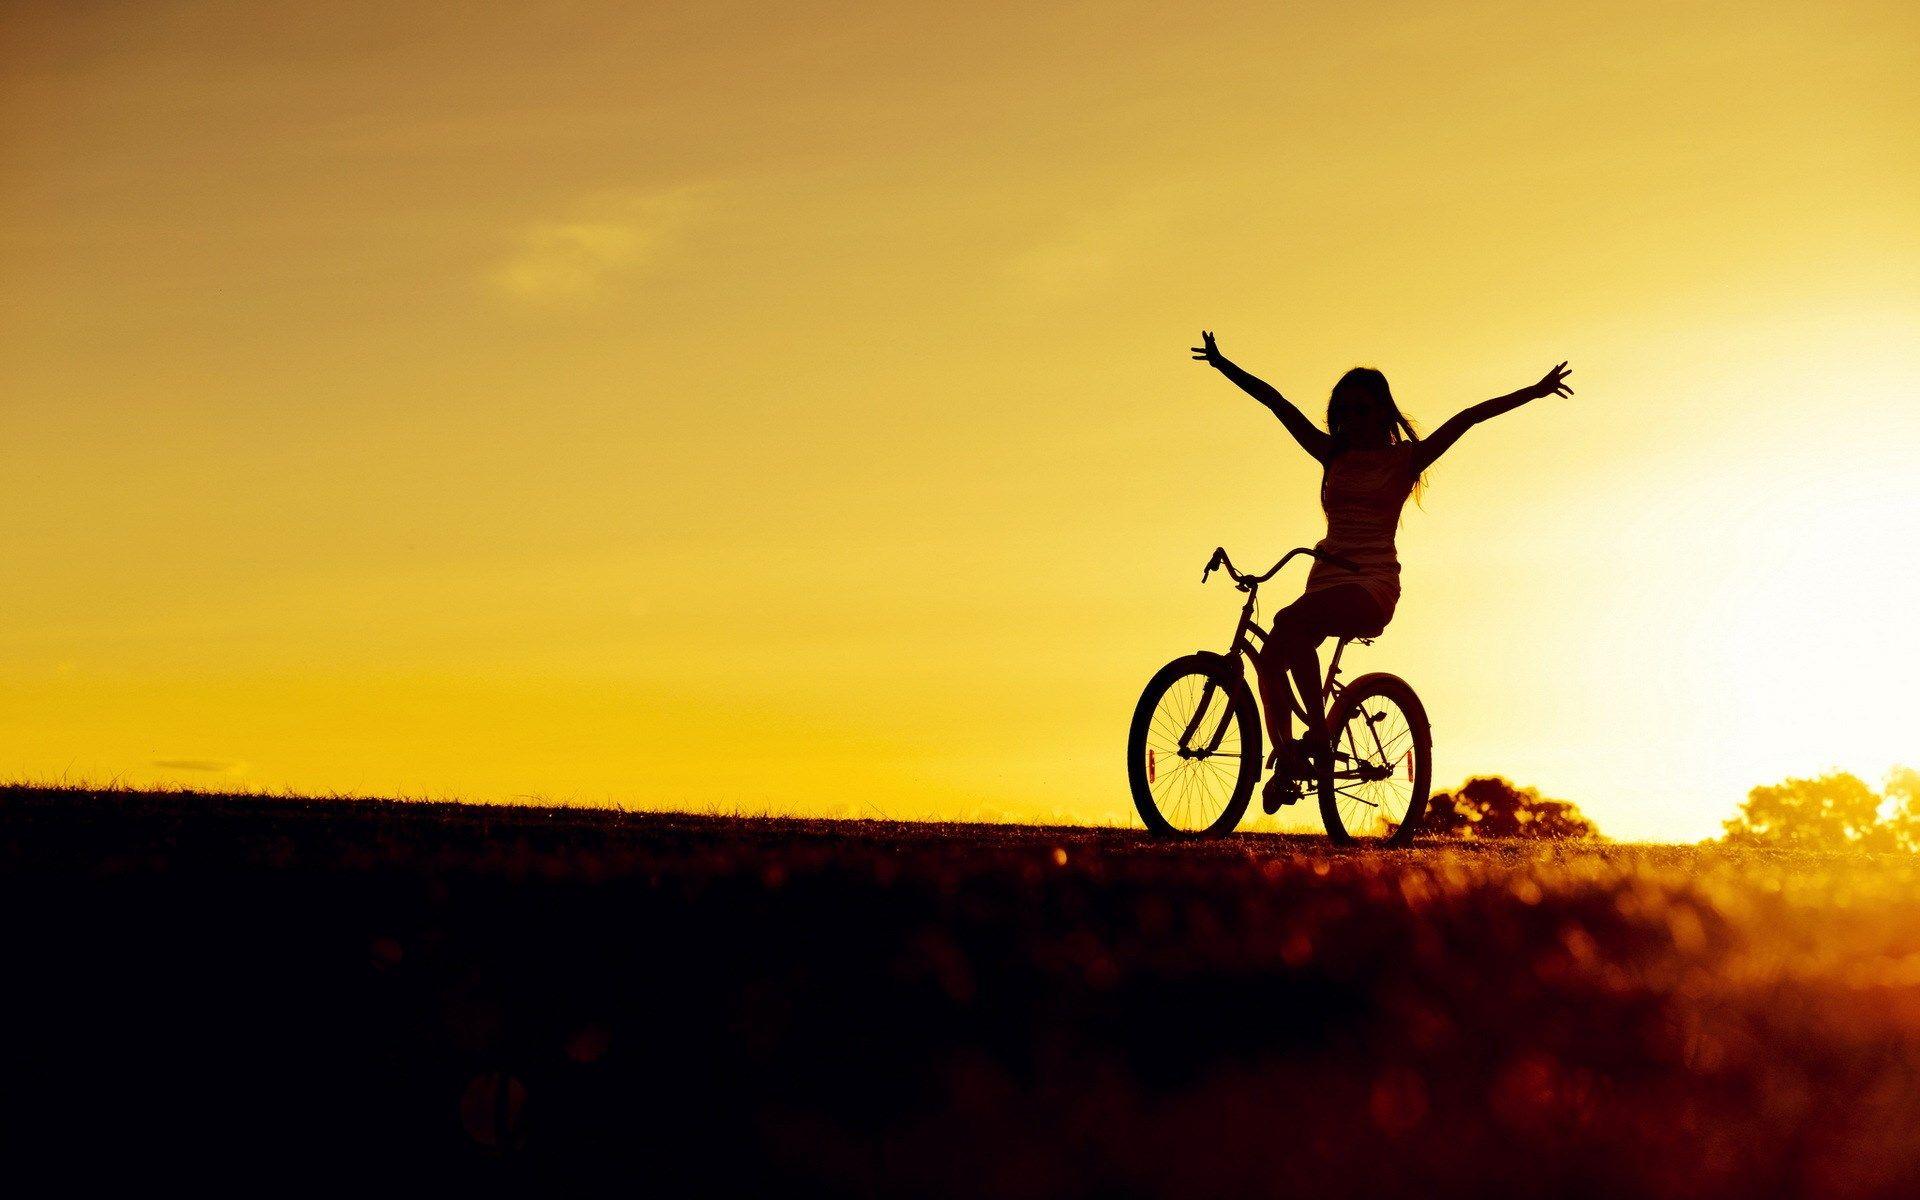 bicycle girl photo hd